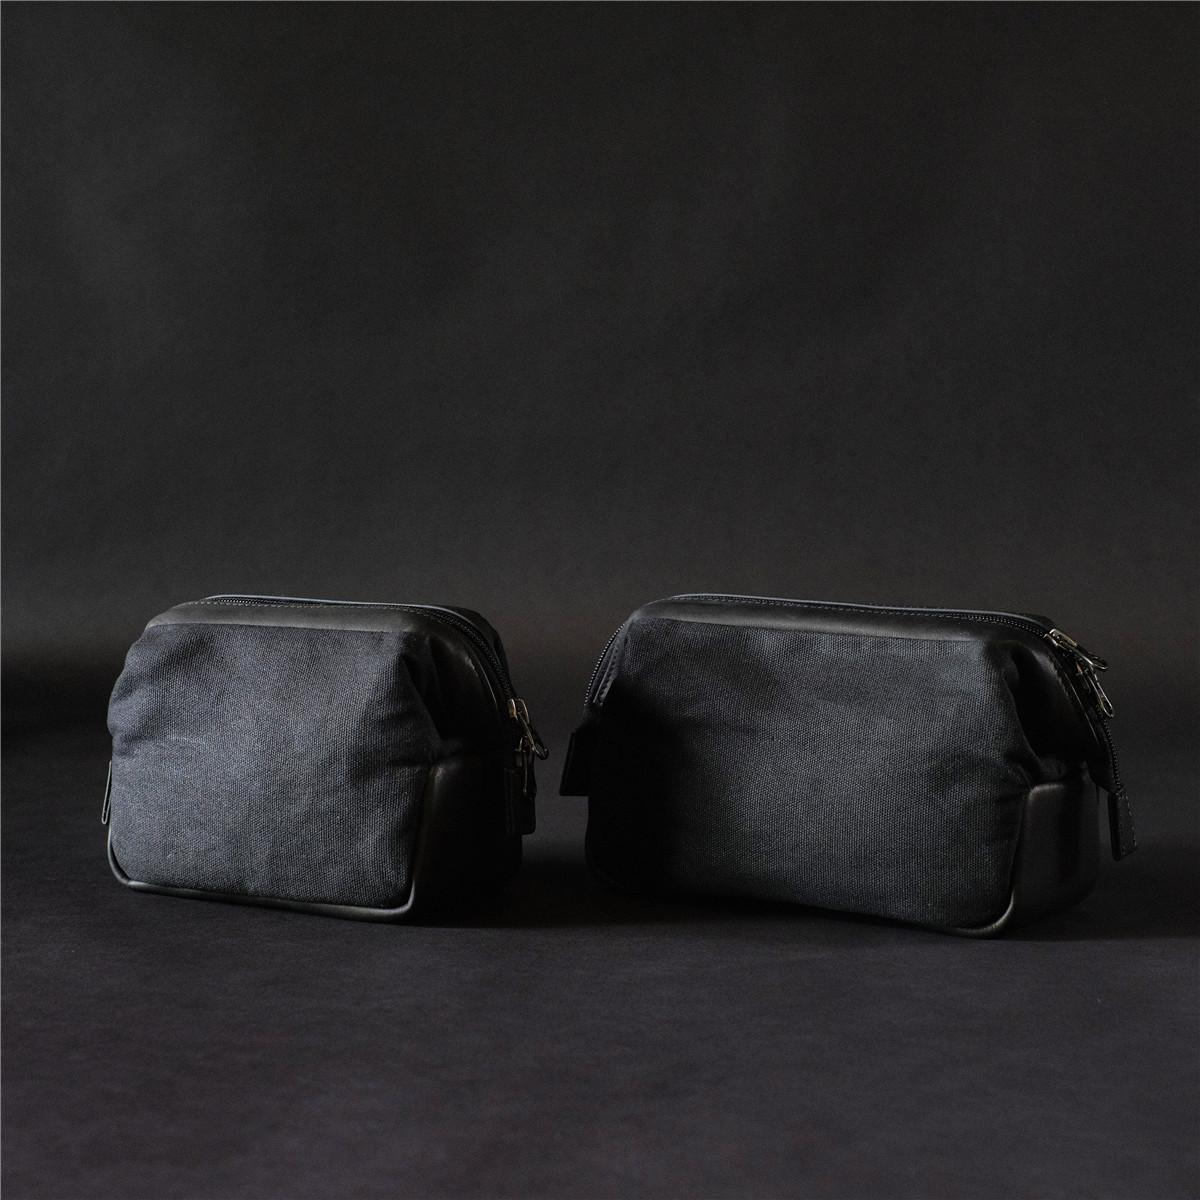 cam-in 真皮/防水蜂蜡布 专业摄影器材收纳包摄影包LCCB-003